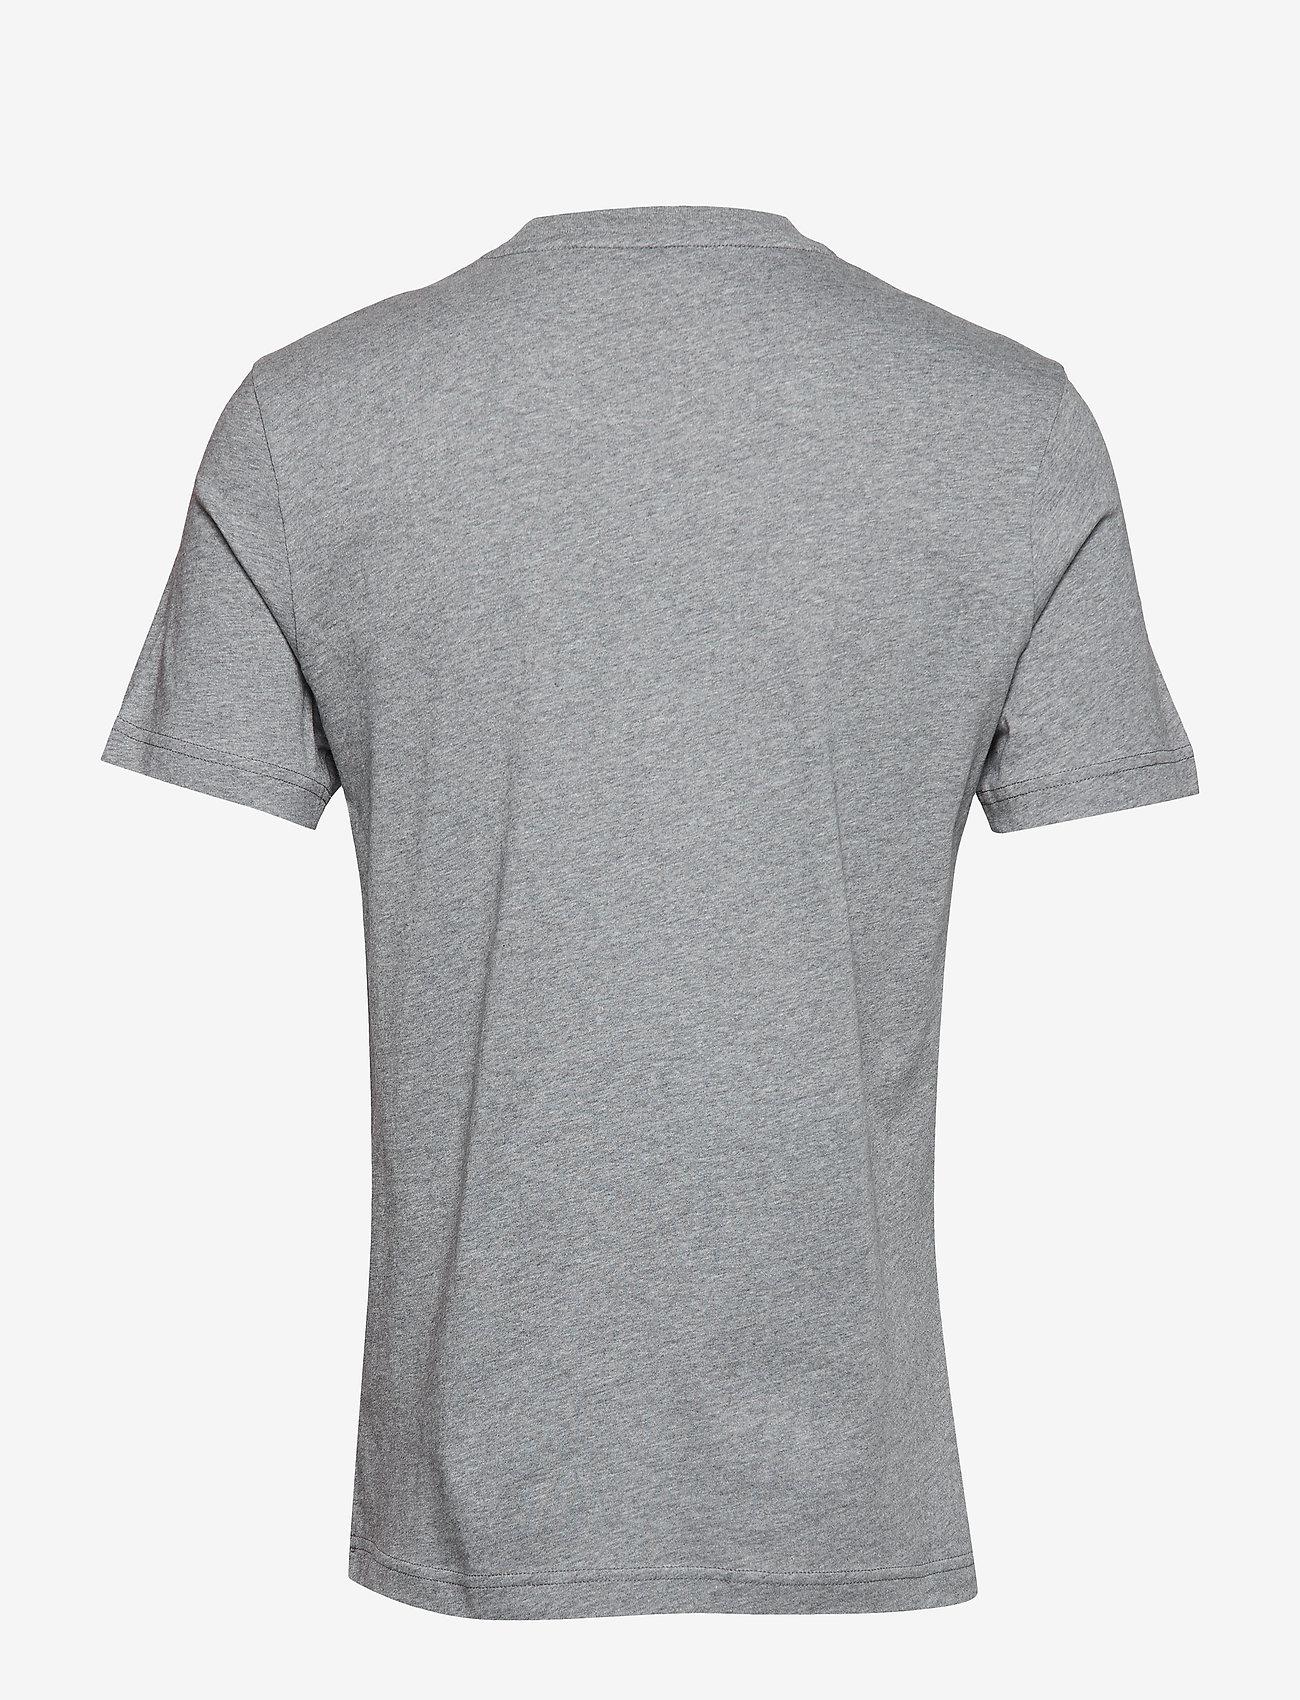 Calvin Klein - COTTON CHEST LOGO T-SHIRT - basic t-shirts - mid grey heather - 1